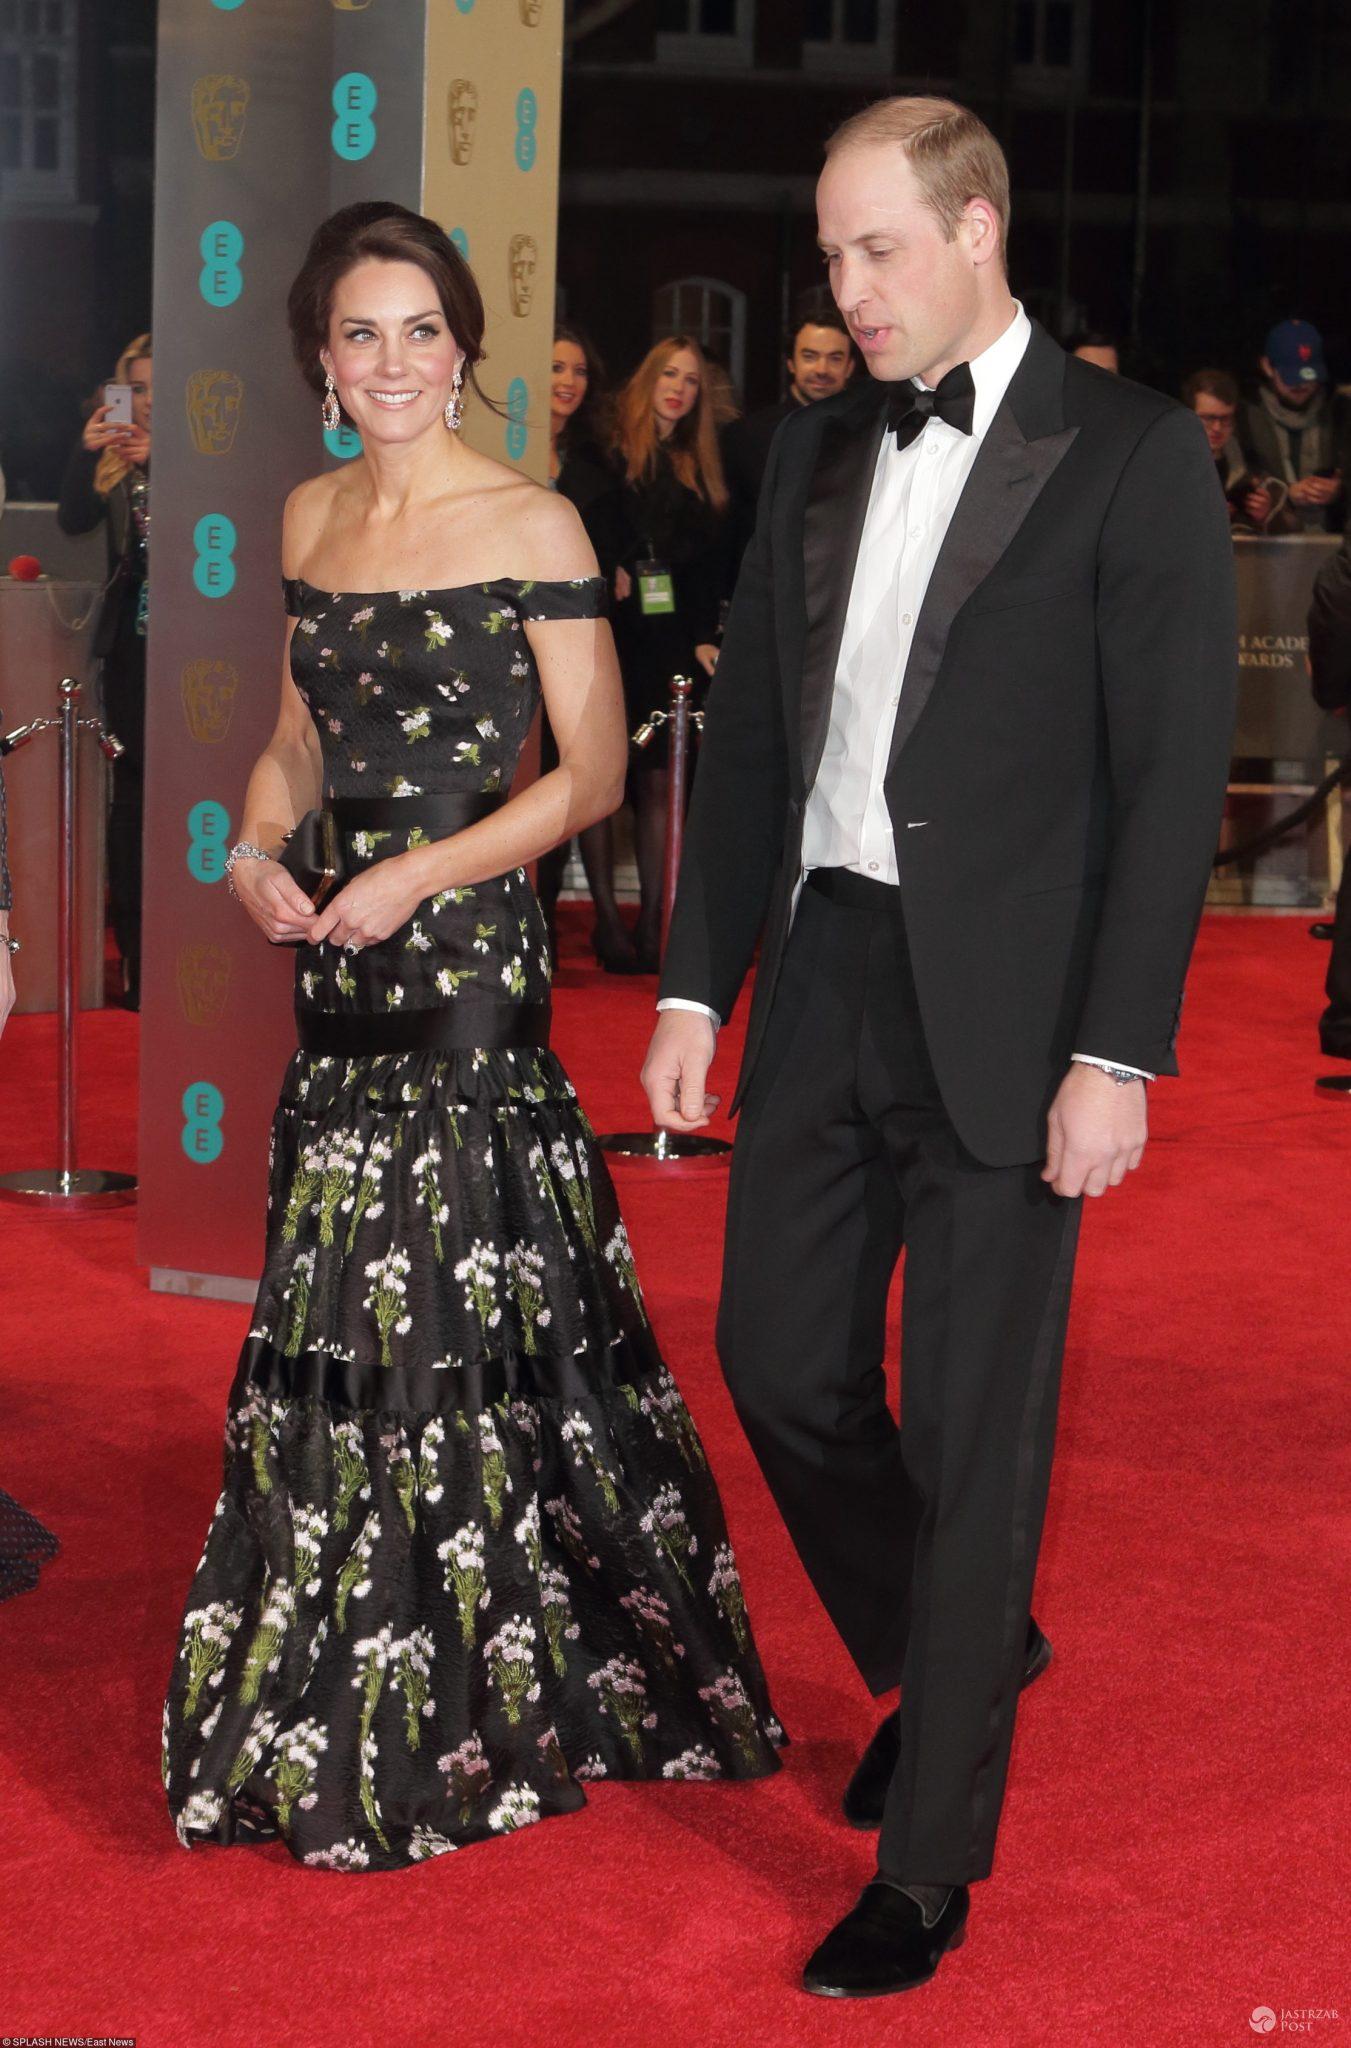 Księżna Kate i Książę William na gali nagród BAFTA